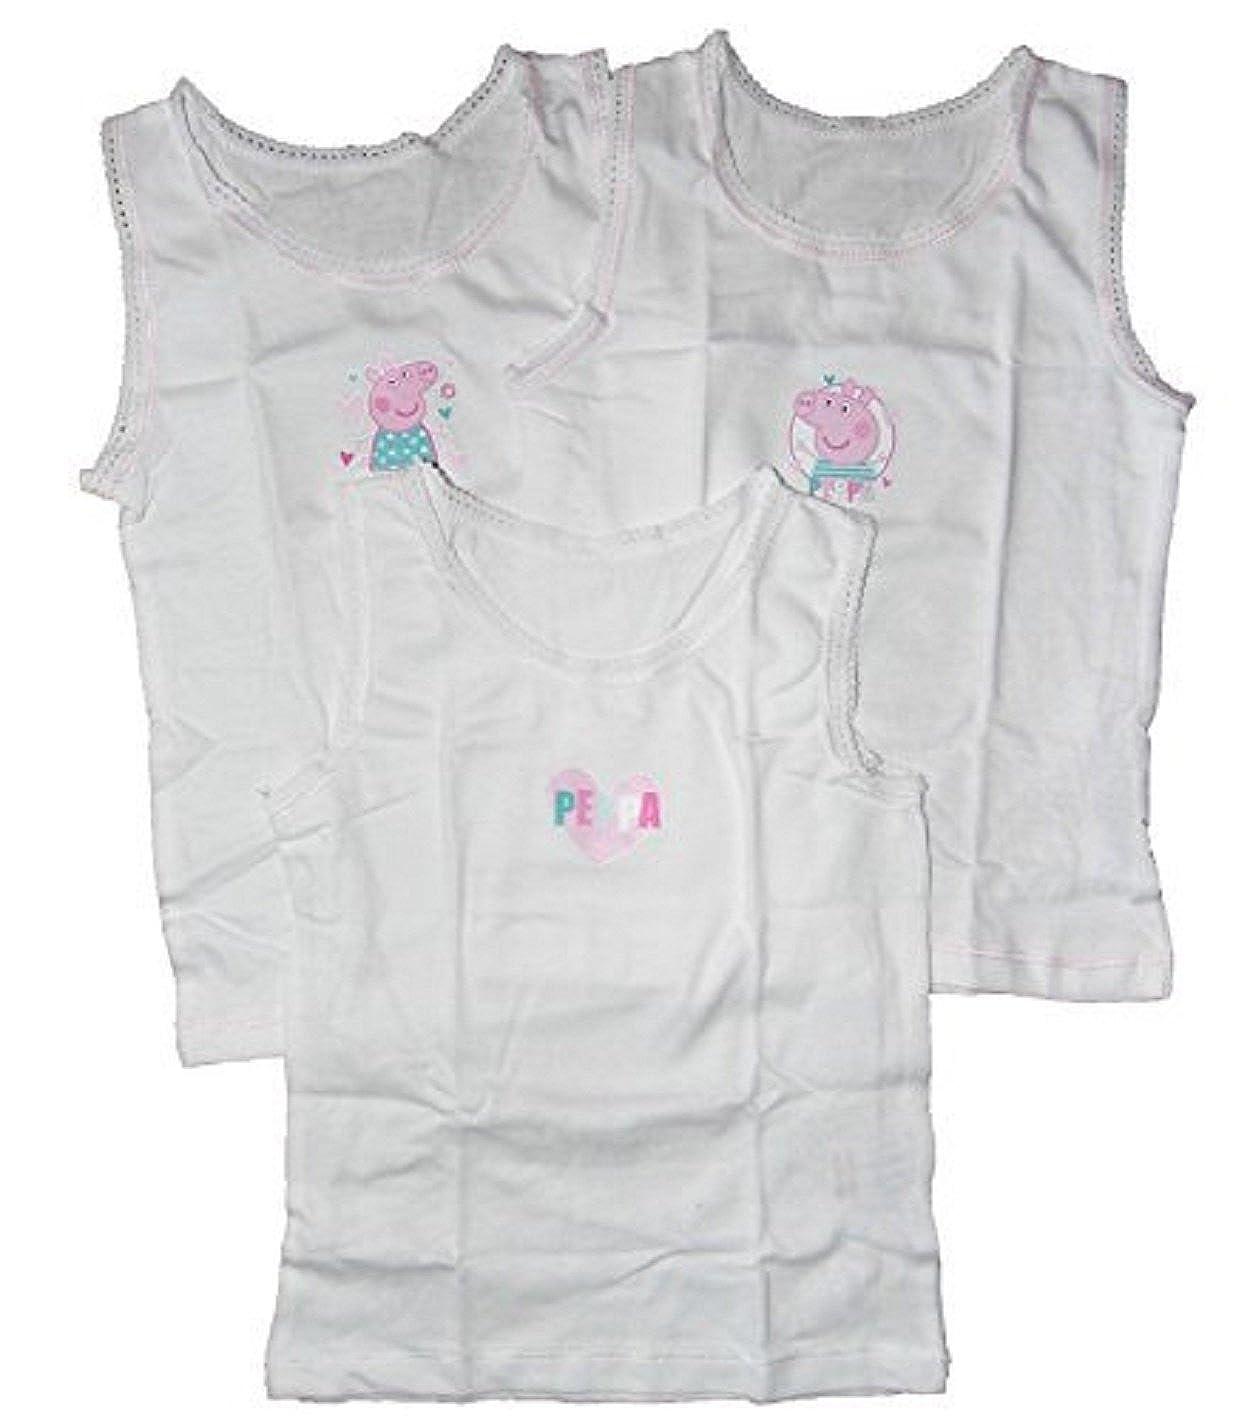 Girls 3 Pack Vest Tops Peppa Pig